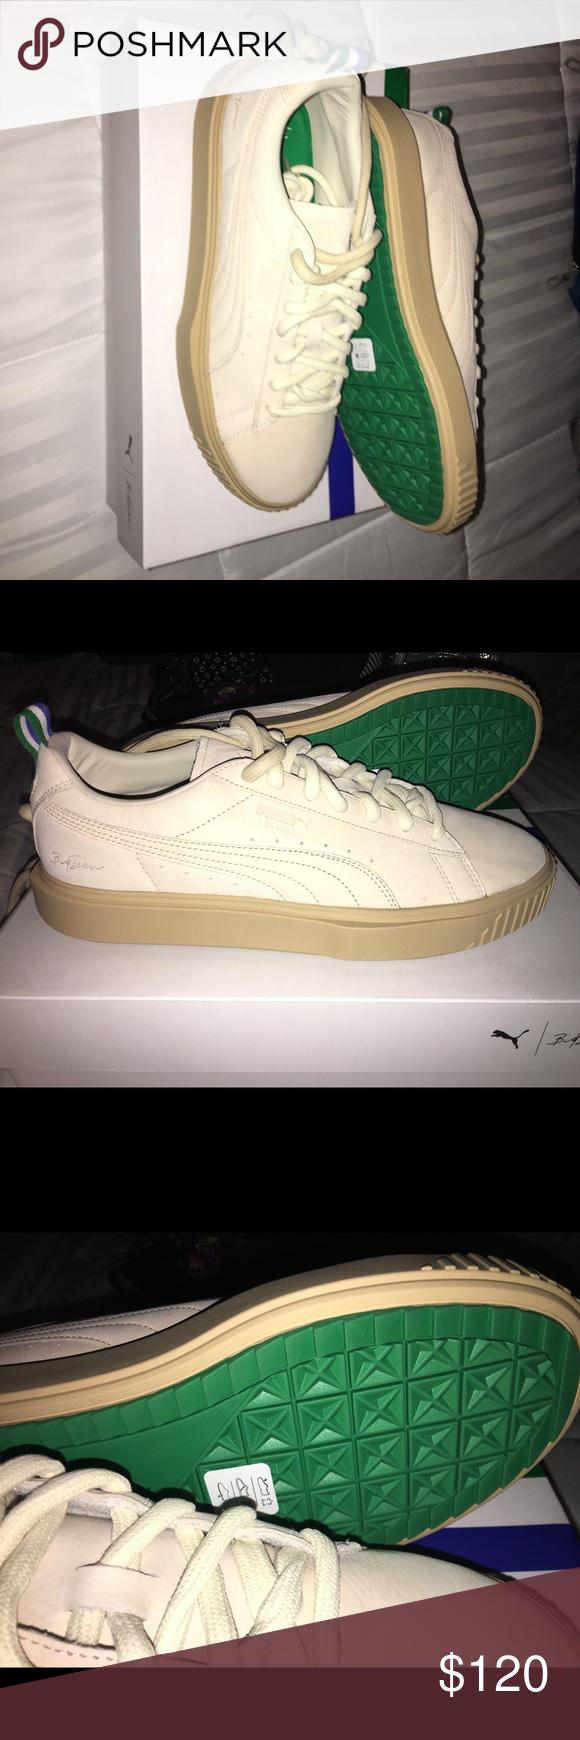 Buy Puma Shoes & Deadstock Sneakers